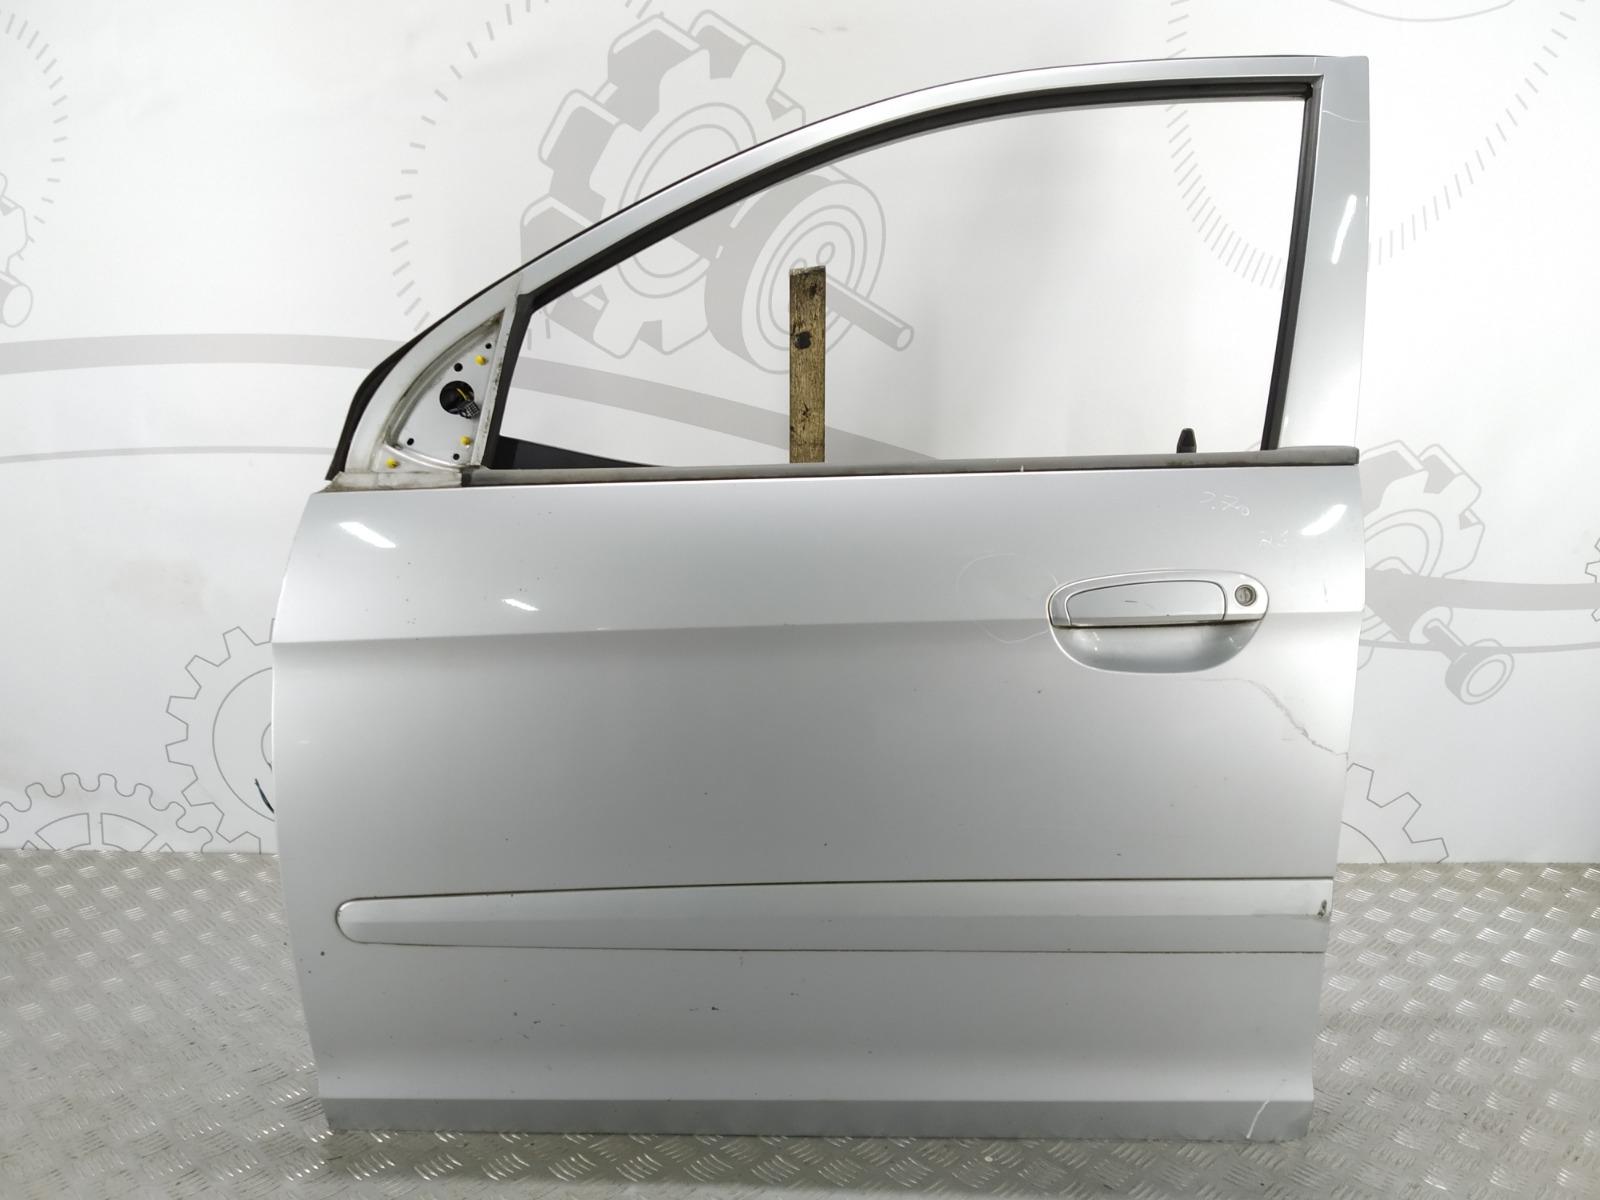 Дверь передняя левая Kia Picanto 1.1 I 2004 (б/у)